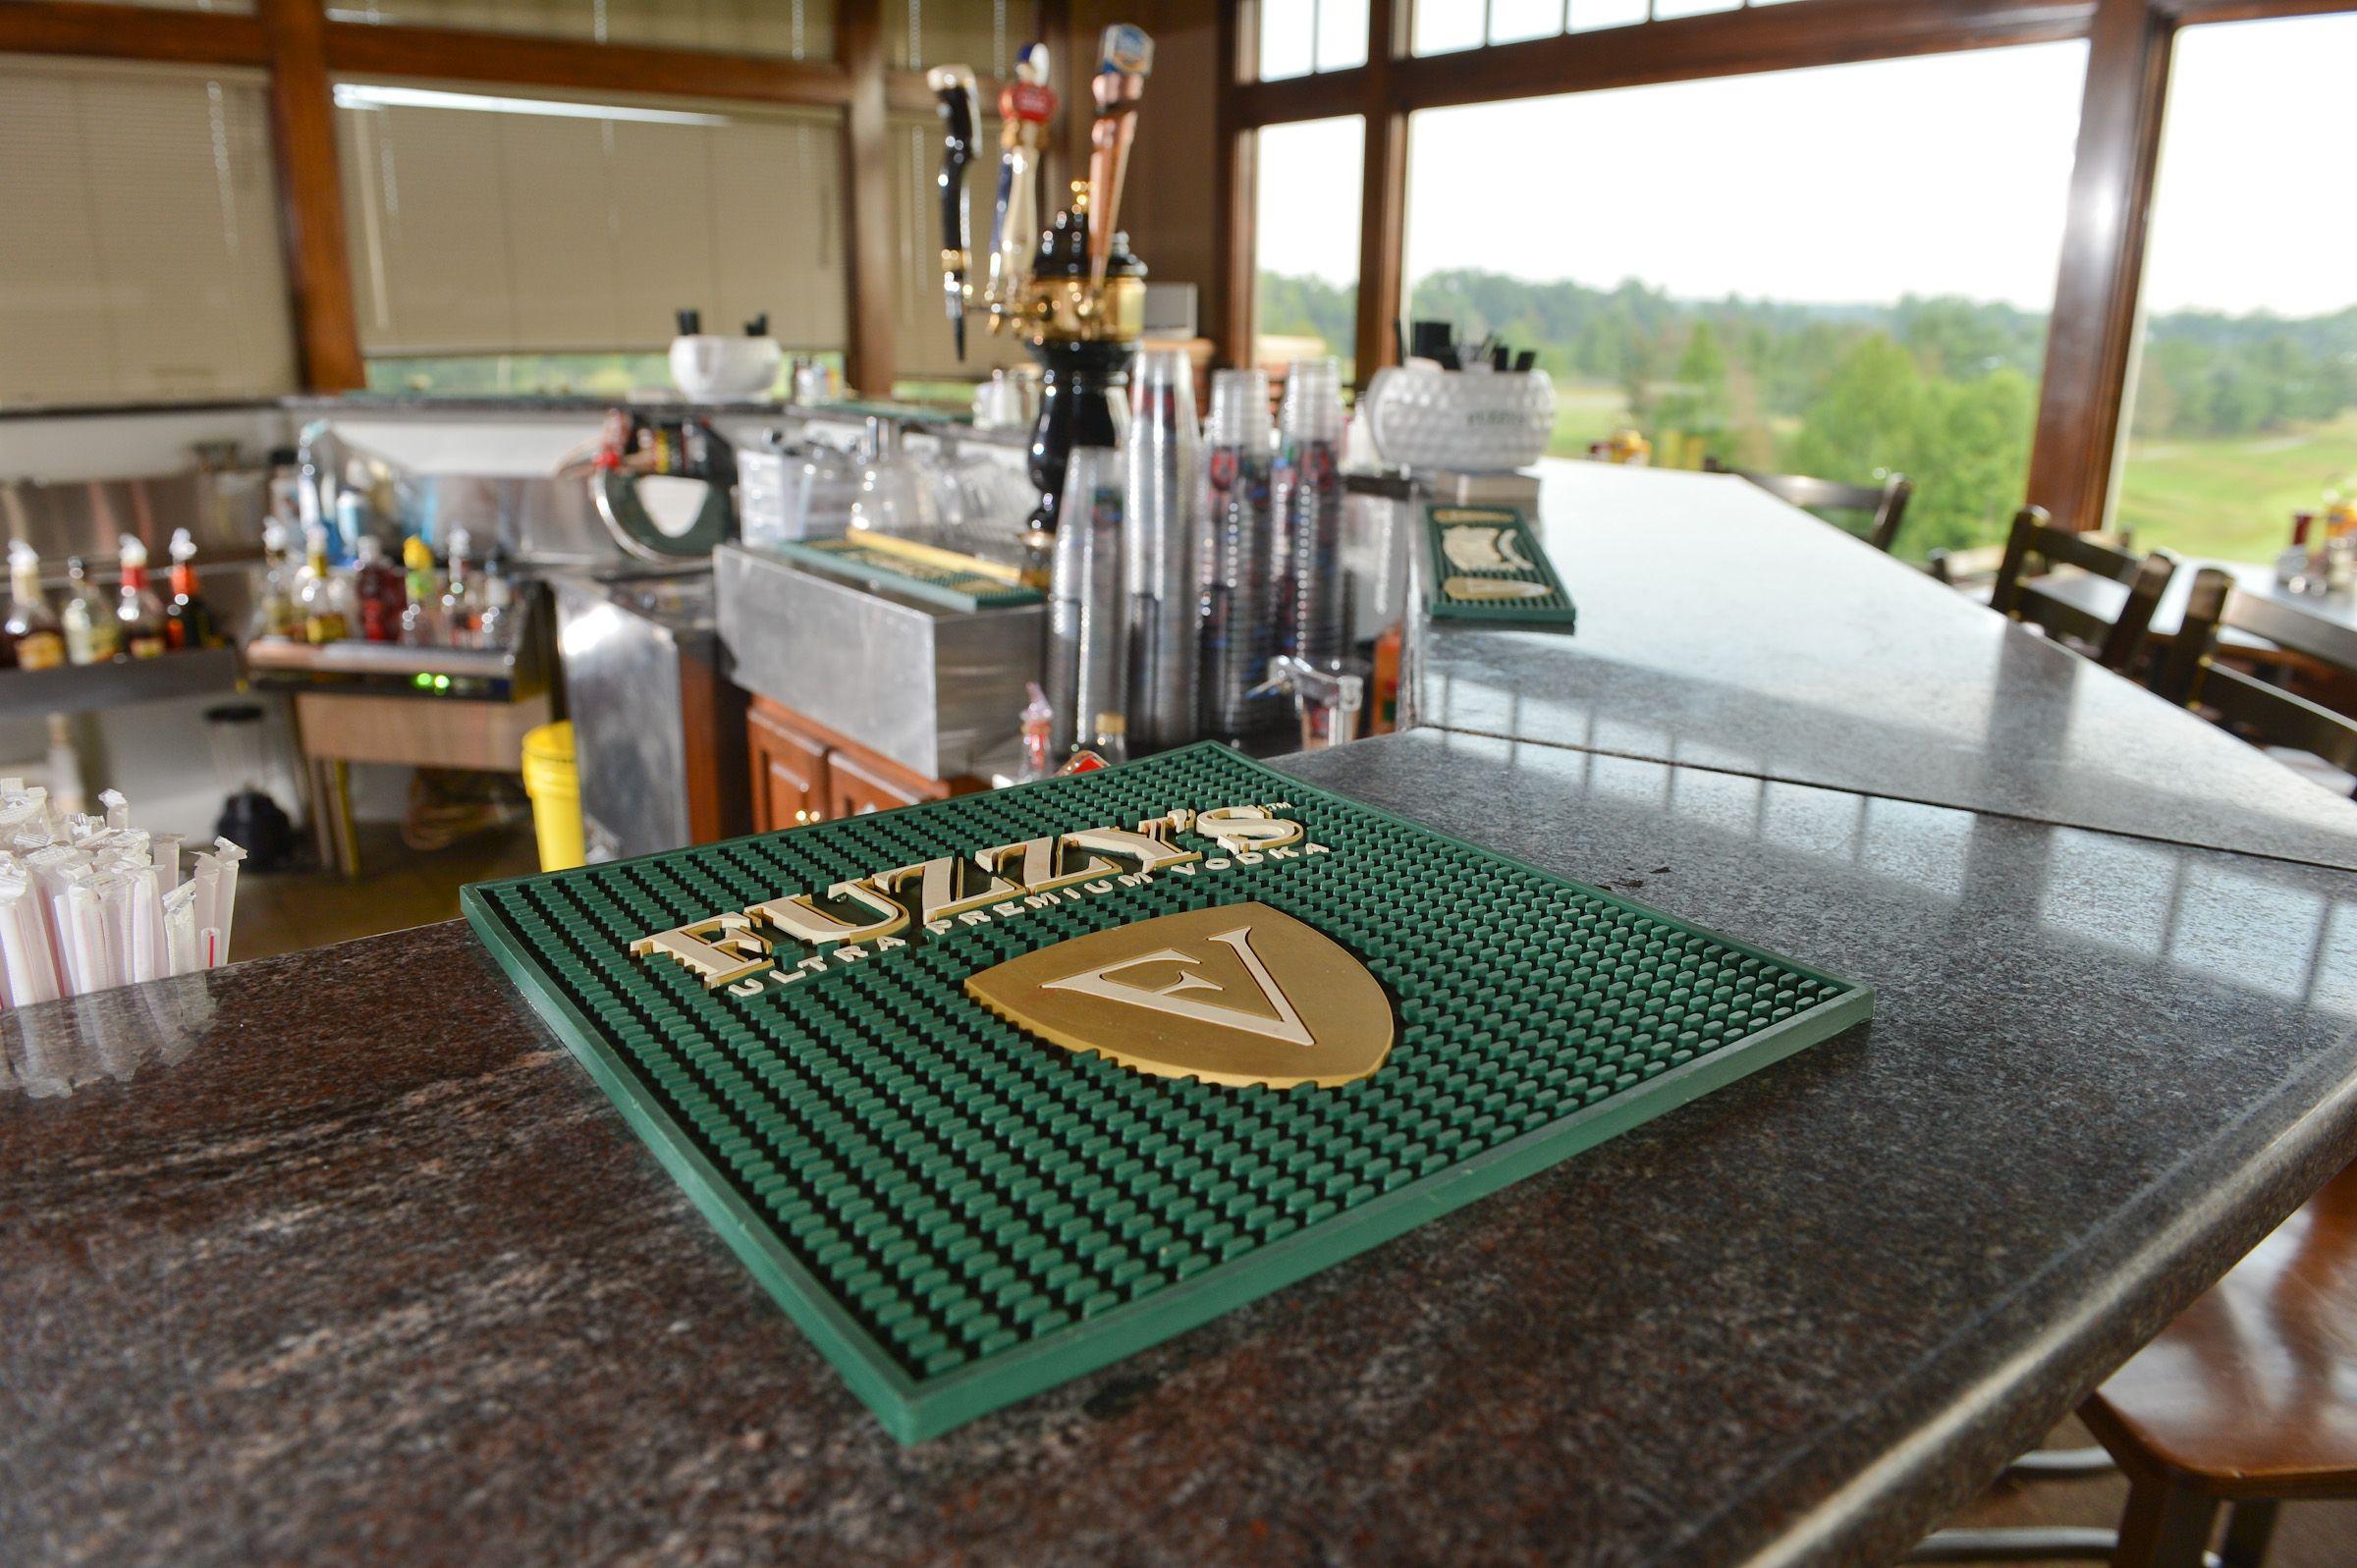 Drink Fuzzy Zoeller's Ultra Premium Vodka at Covered Bridge Golf Club